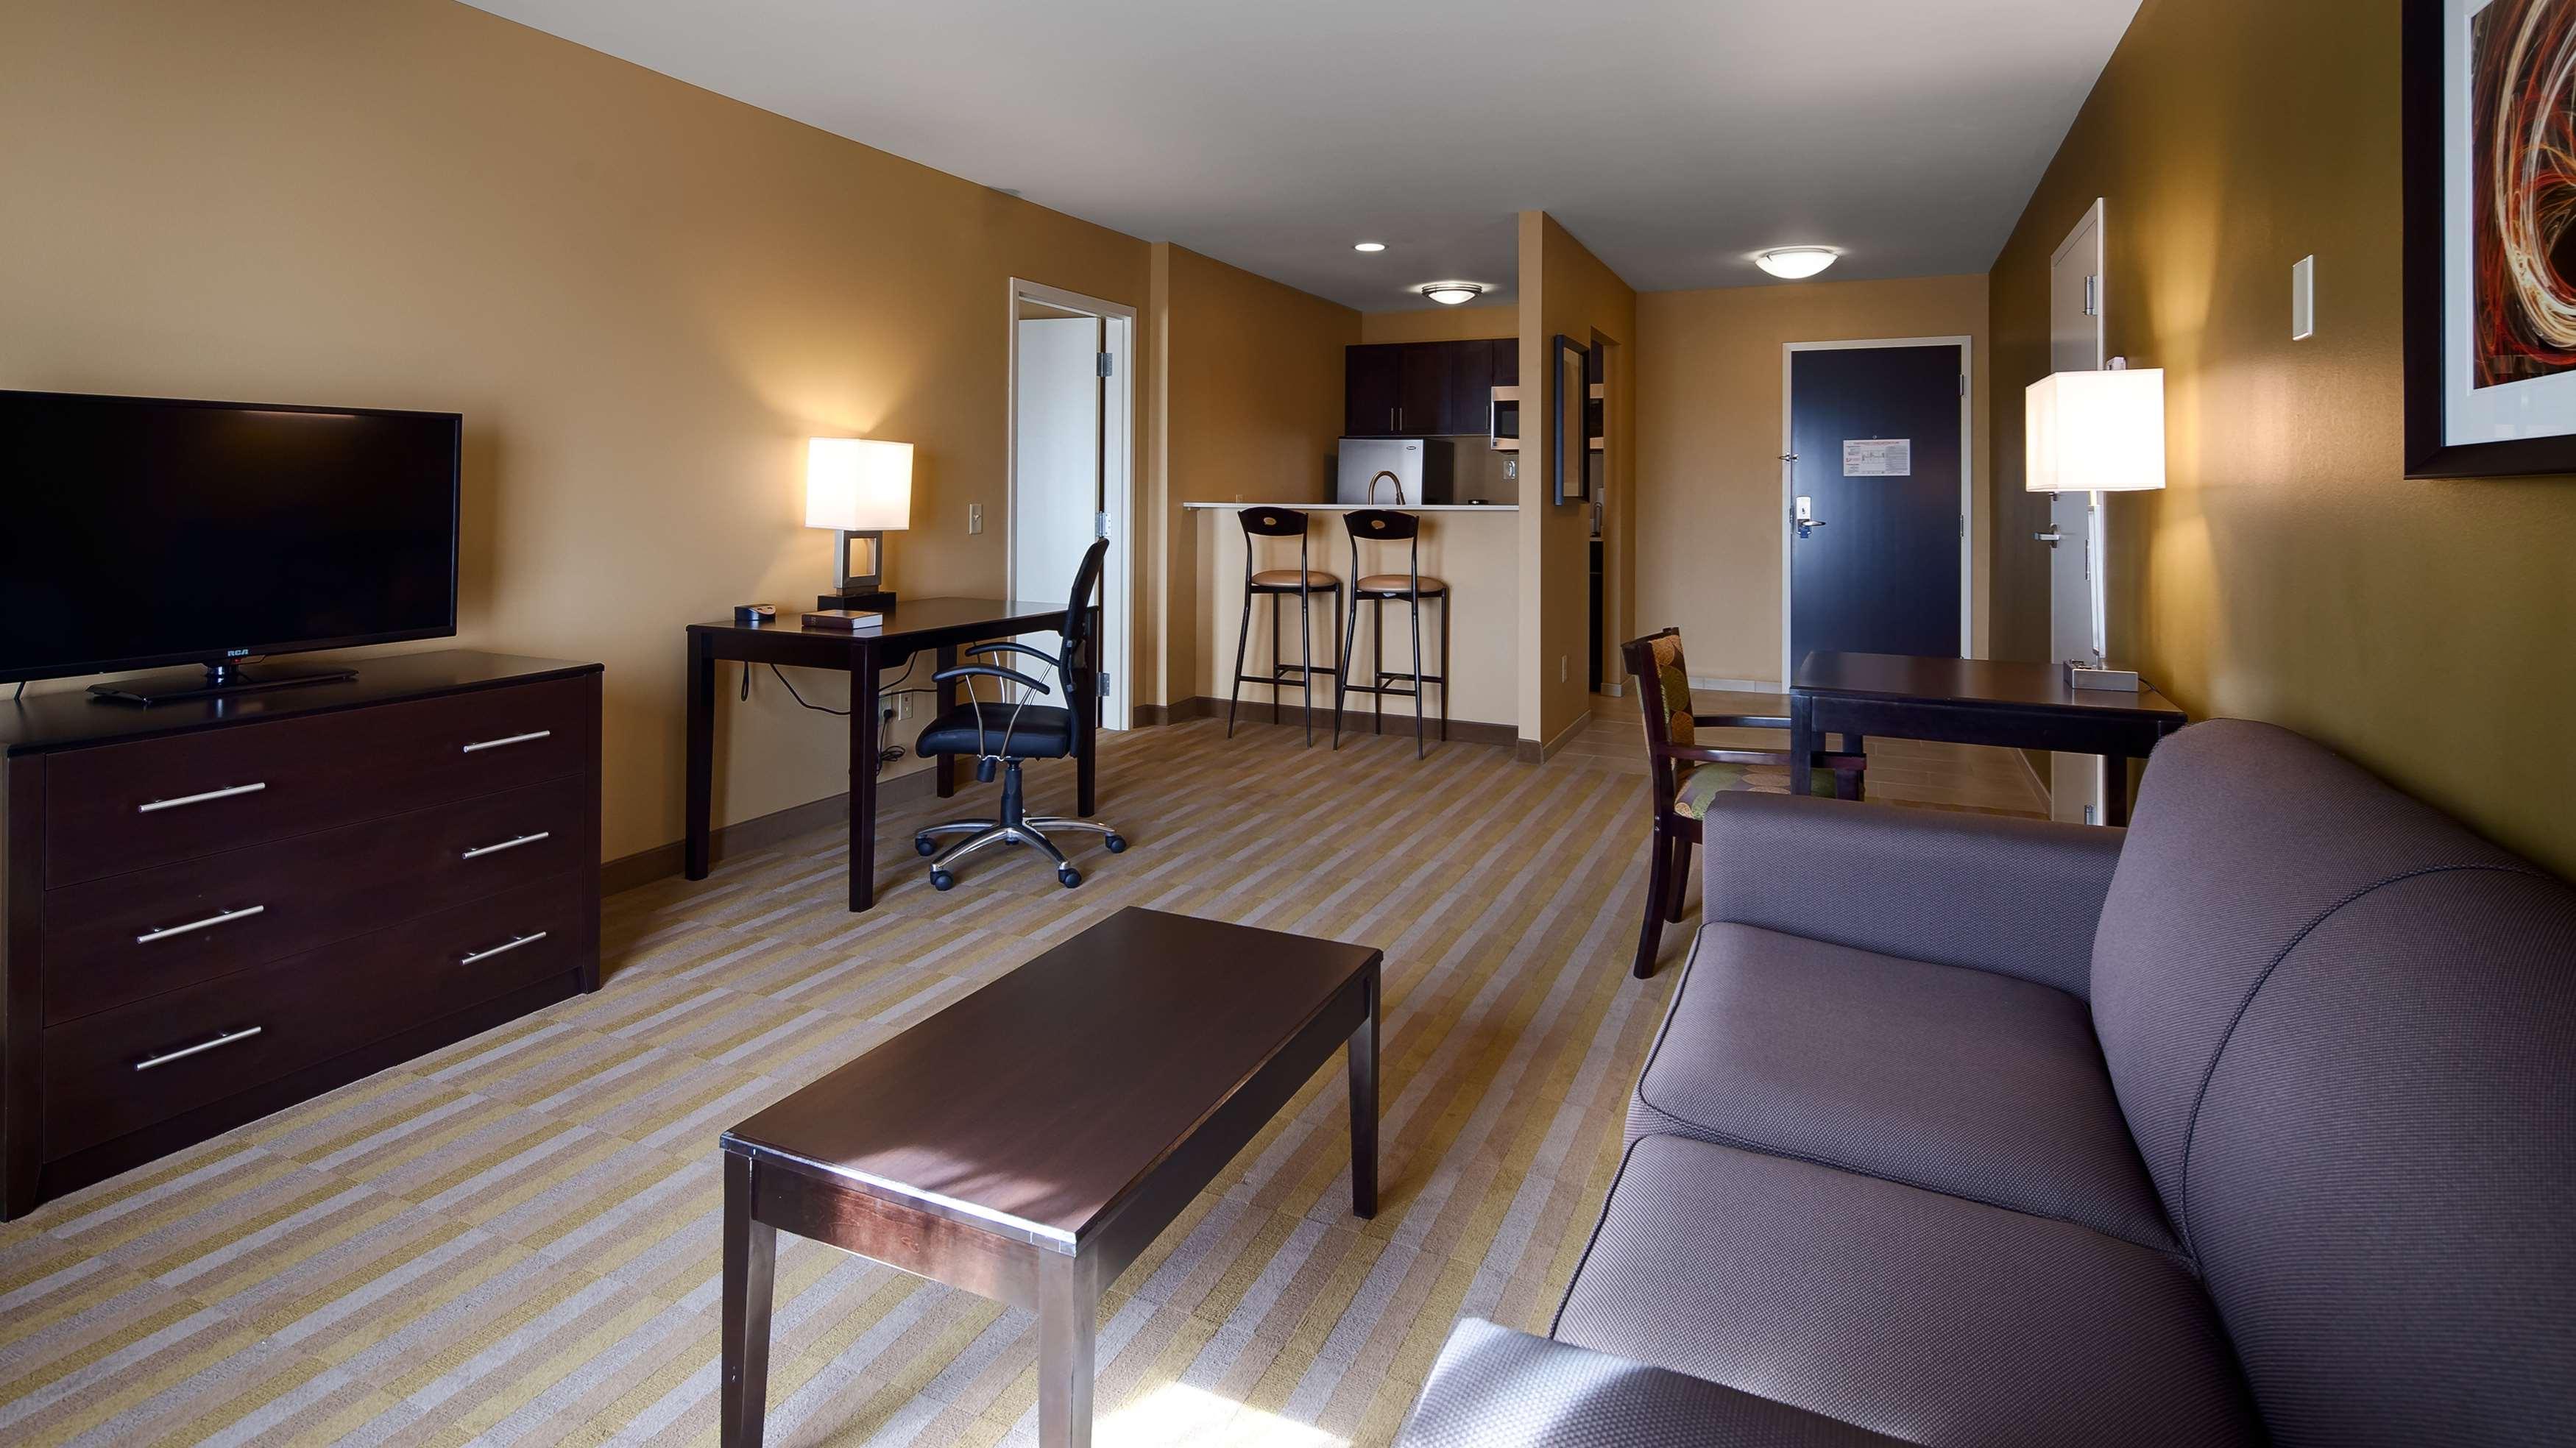 Best Western Plus Thornburg Inn & Suites image 16